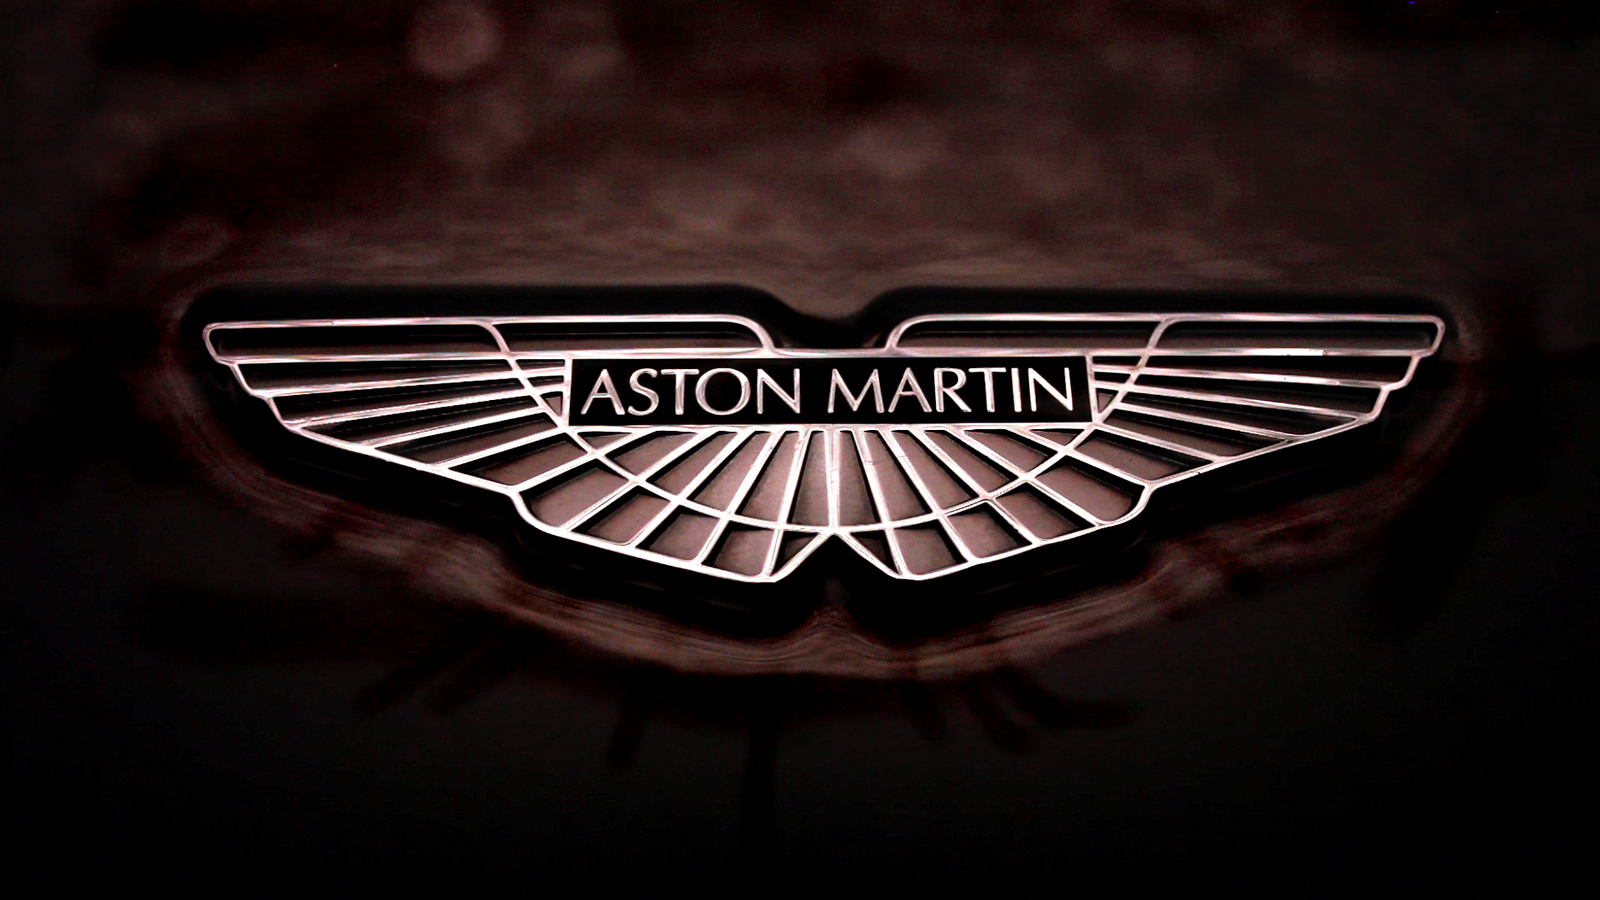 aston martin logo | aston martin | pinterest | aston martin